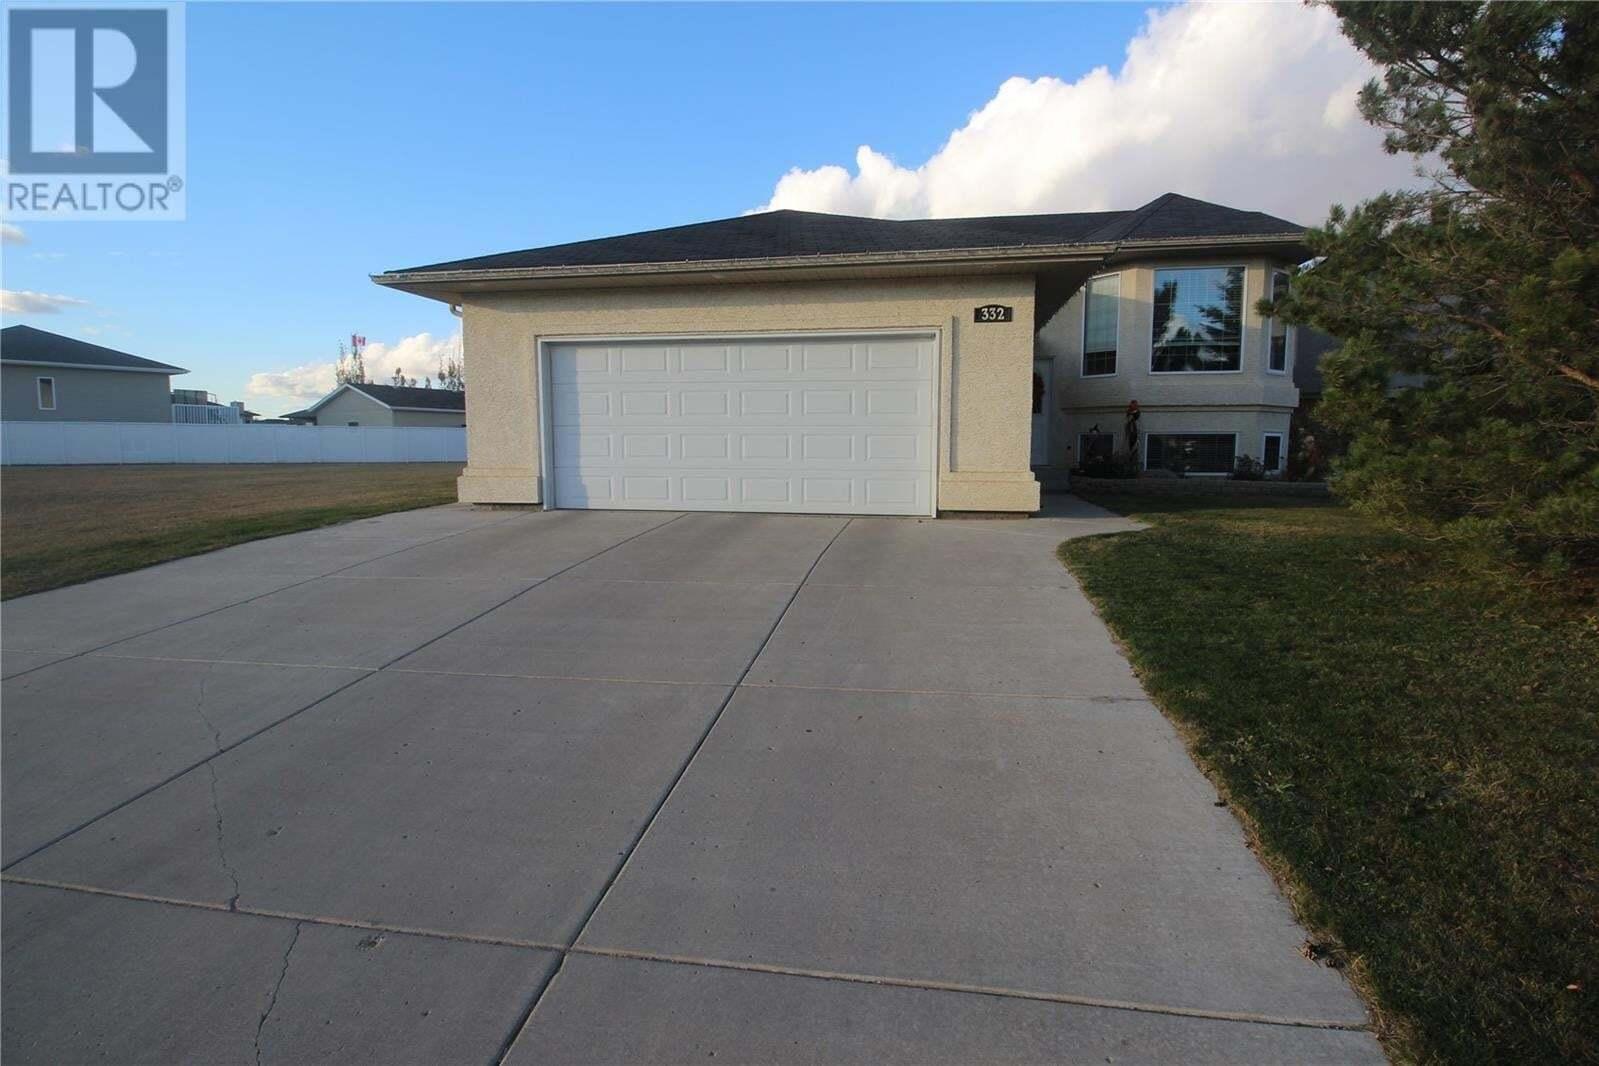 House for sale at 332 Brooklyn Cres Warman Saskatchewan - MLS: SK830332